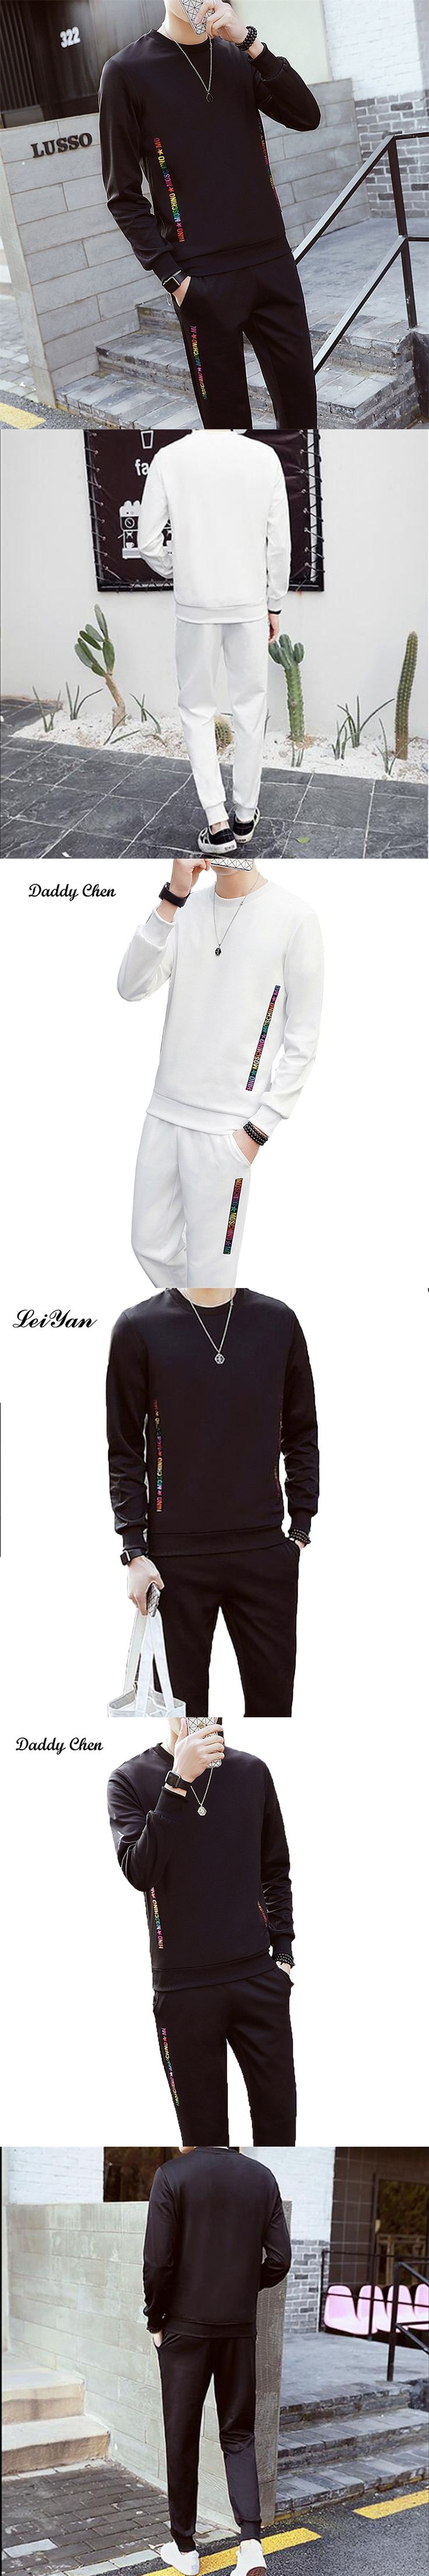 2017 brand sporting suit men winter clothes O Neck solid sweat suits sets track tracksuit color letter sportswear survetement